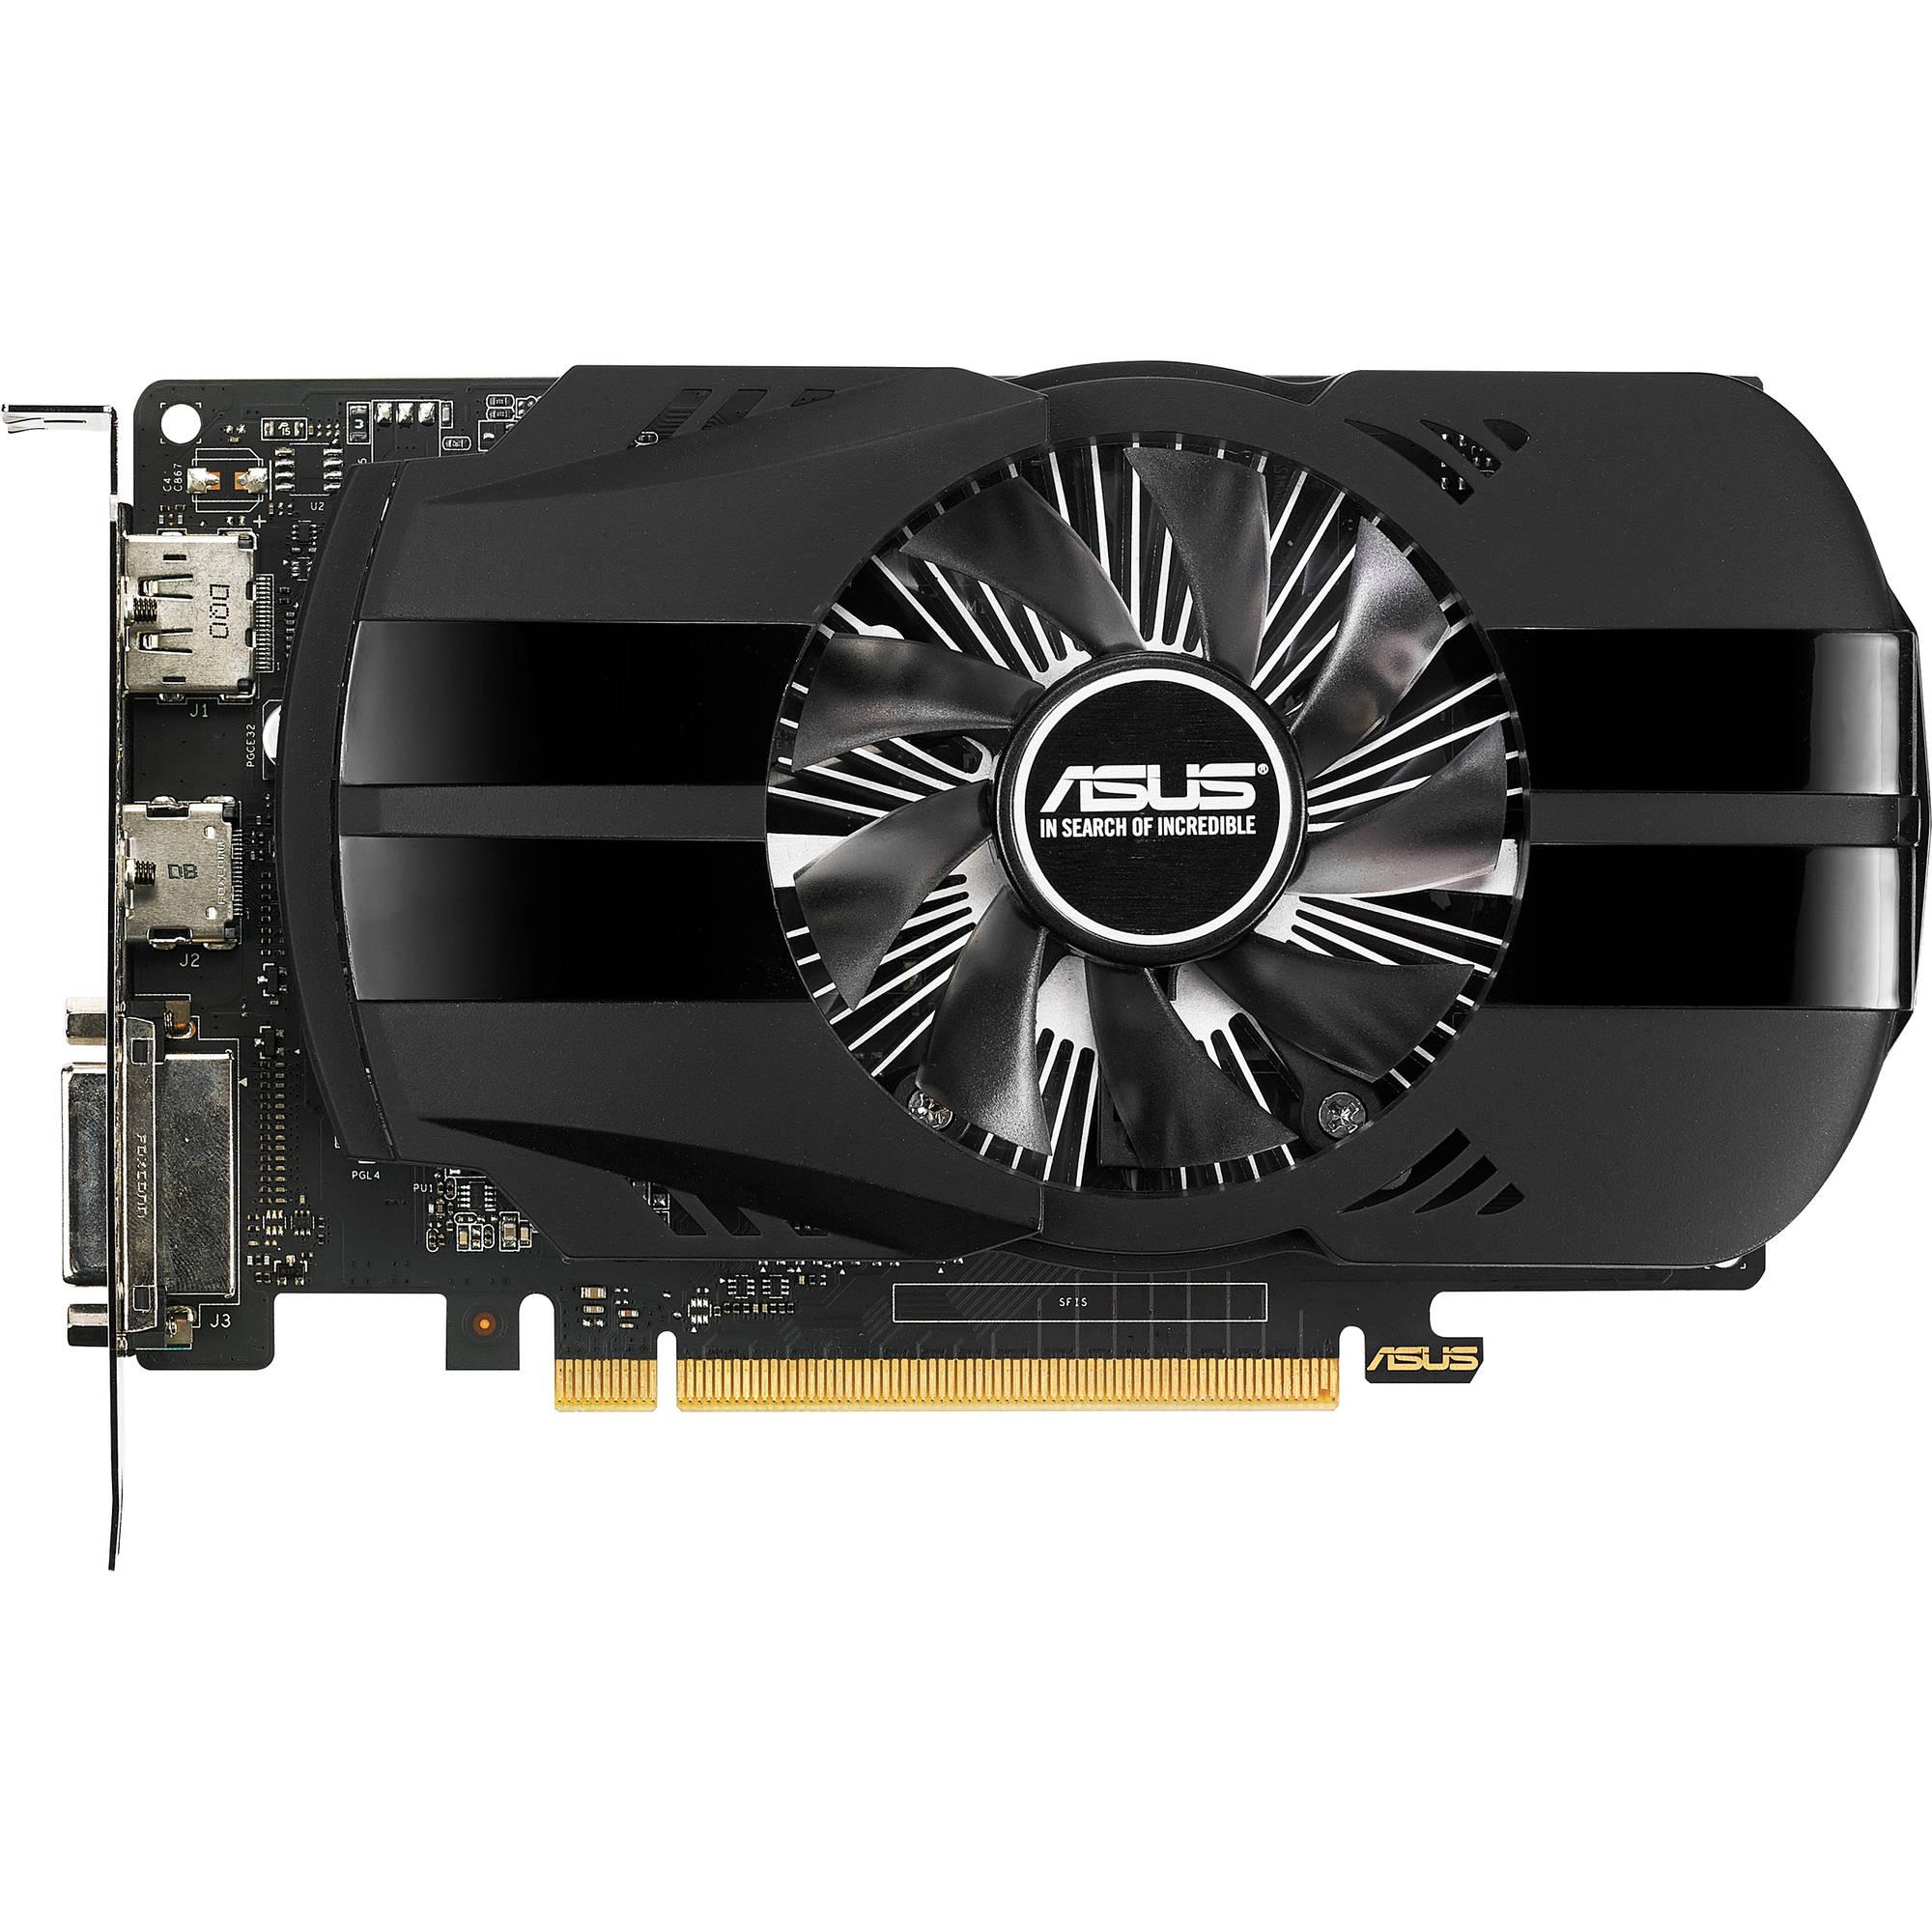 Asus nVidia GeForce GTX 1050 2GB 128bit (PH-GTX1050-2G)